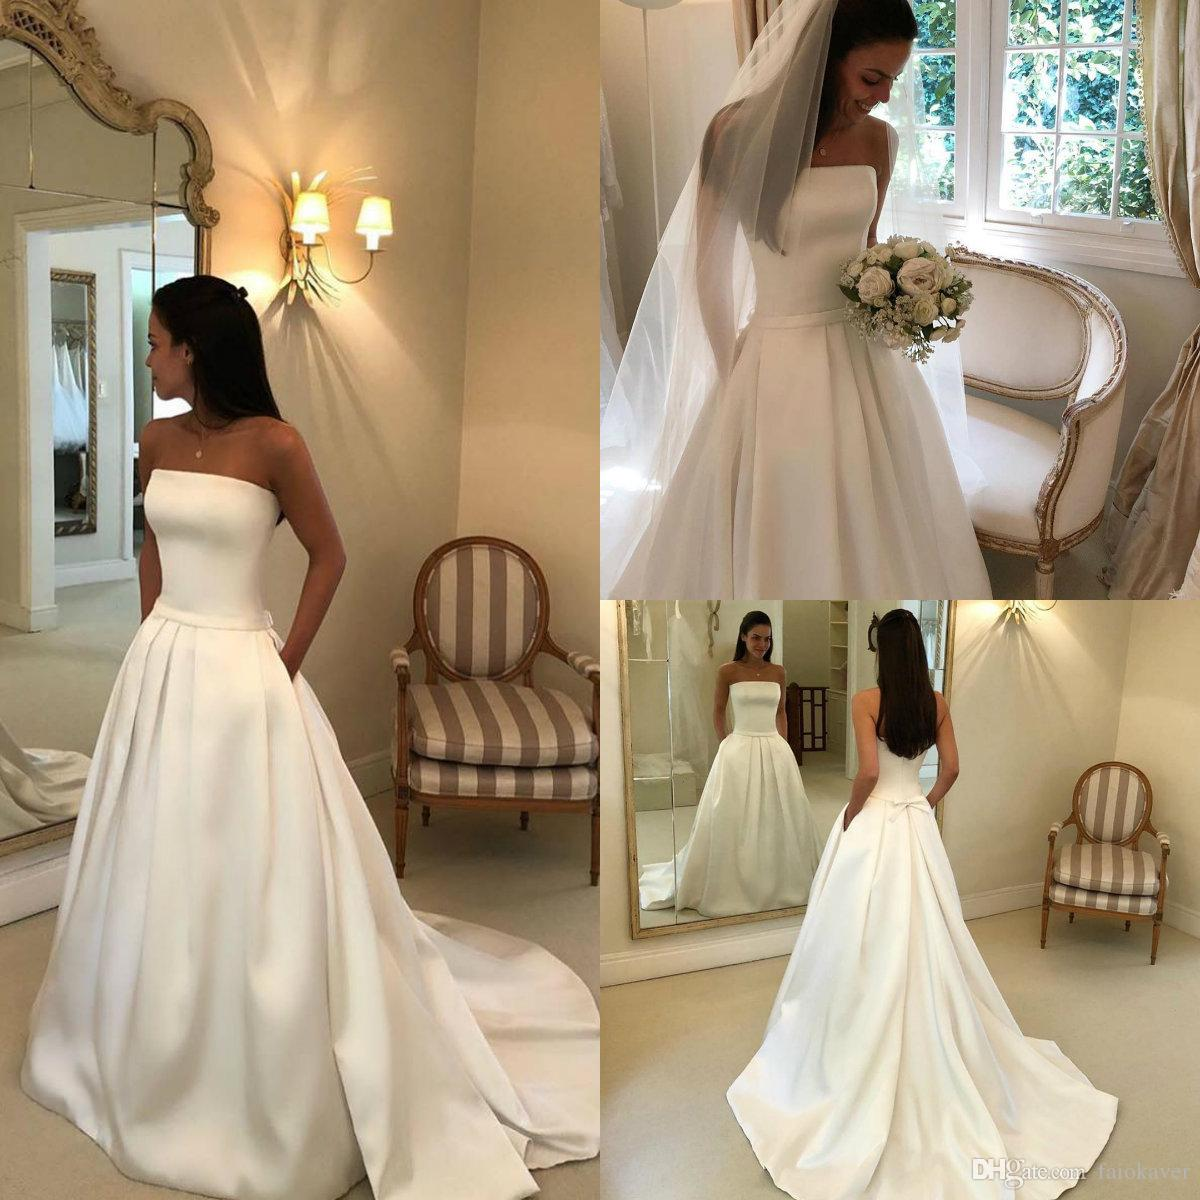 2019 Simple Satin Wedding Dresses With Pocket Strapless A Line Sweep Train Beach Wedding Dress Custom Made Cheap Bridal Gowns Garden Wear